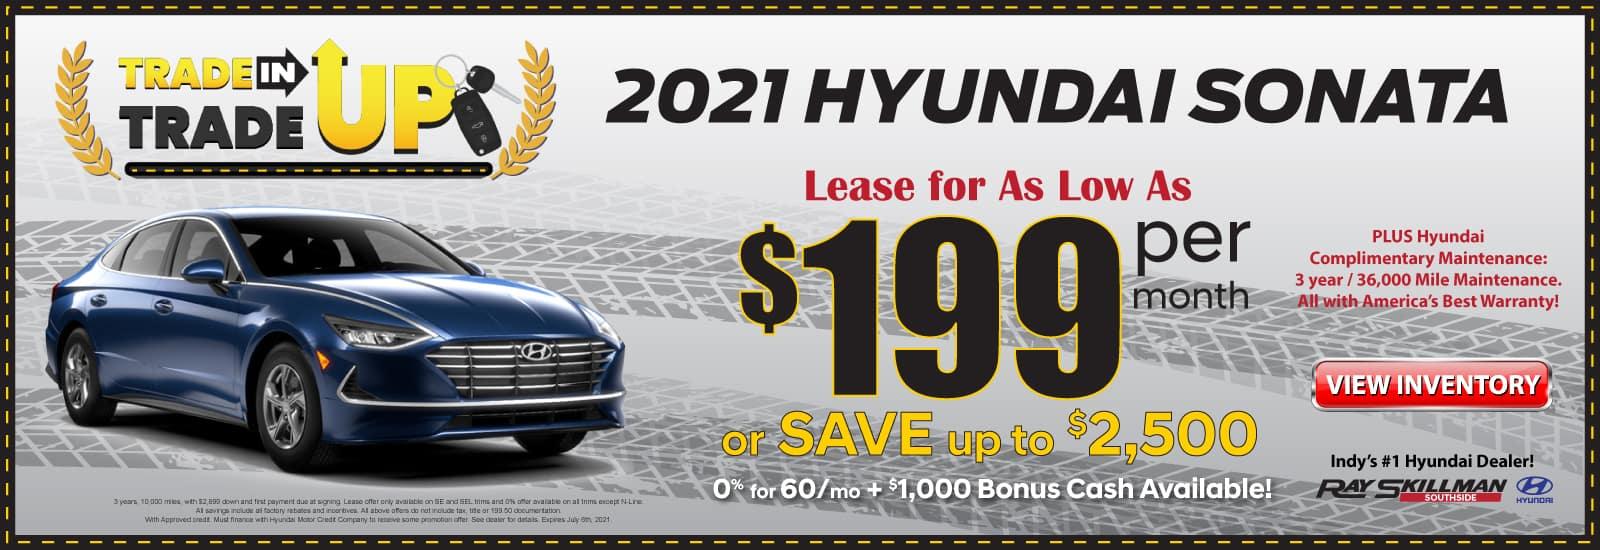 2021-Hyundai-Sonata-Web-Banner-June